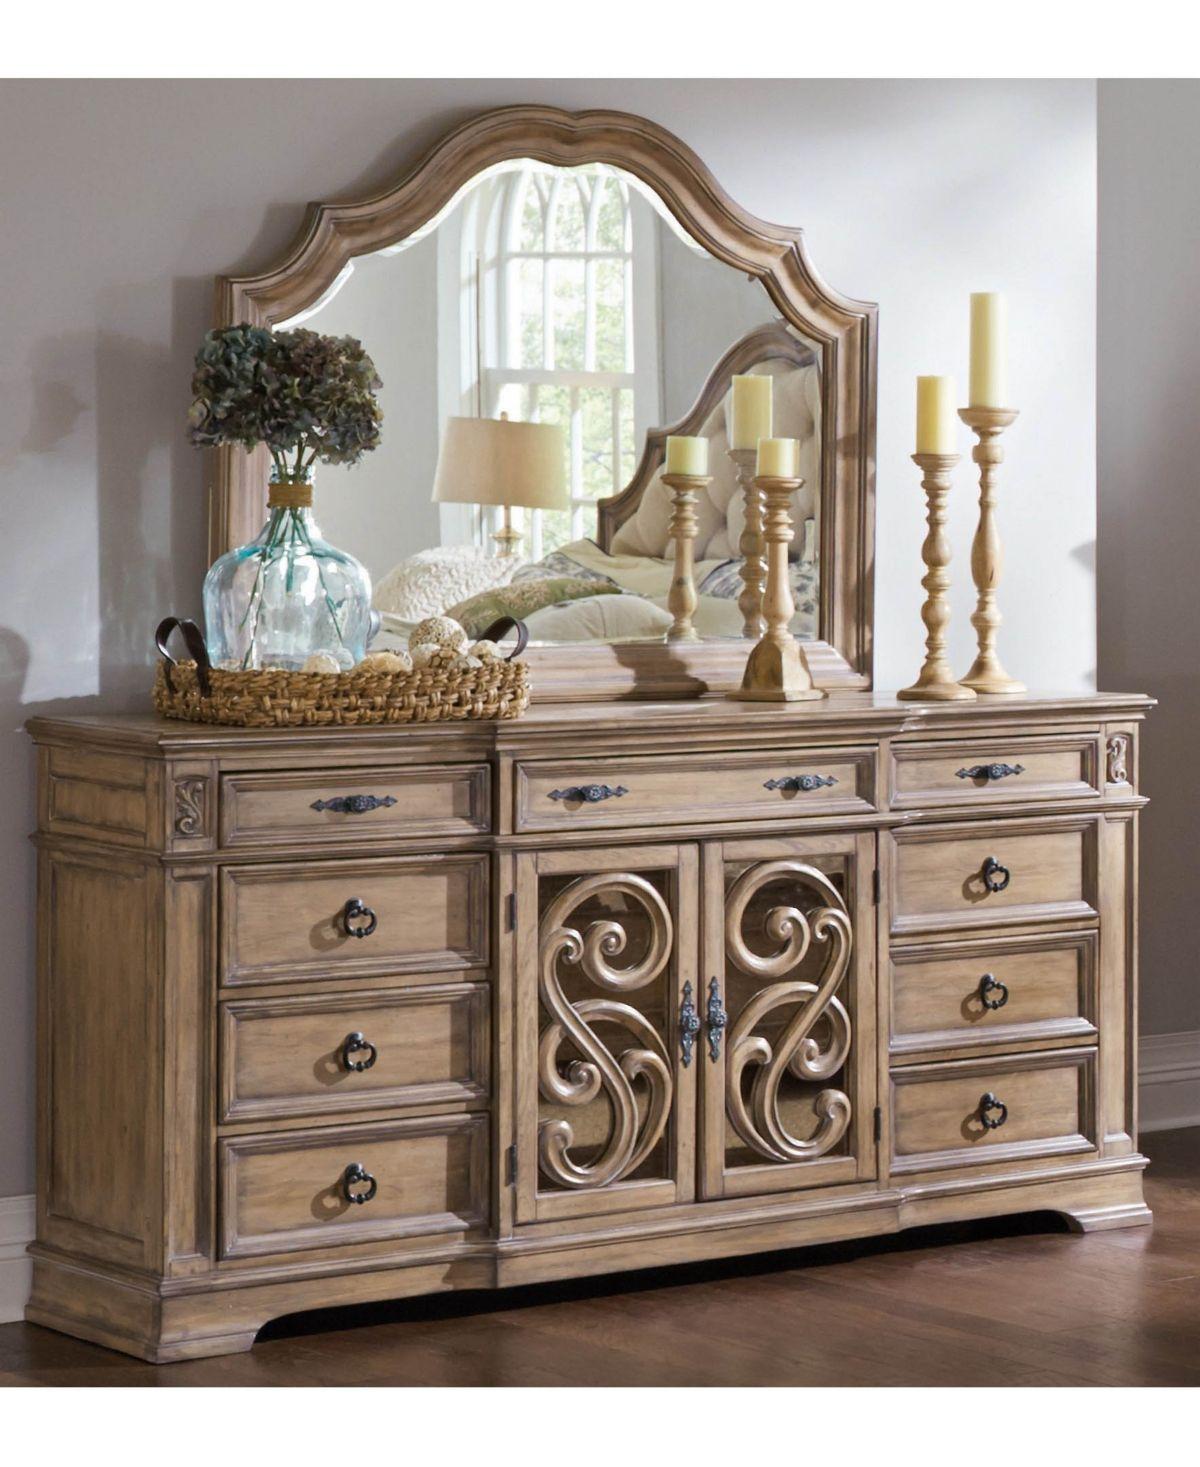 Macy S Coaster Home Furnishings Ilana 9 Drawer Dresser Reviews Furniture Macy S Wooden Dresser Coaster Furniture Furniture